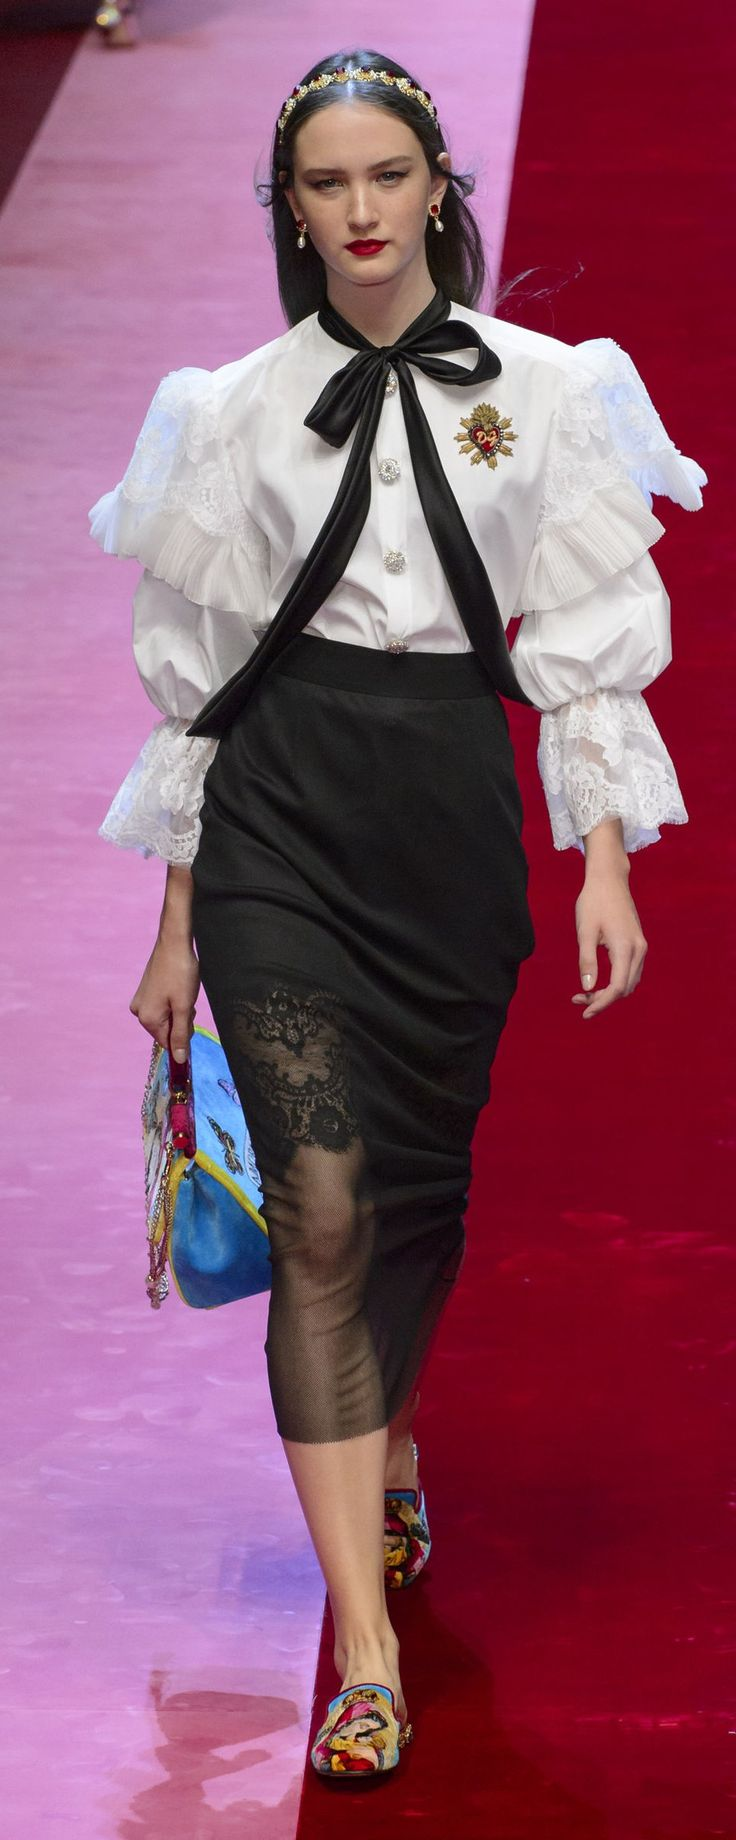 Dolce & Gabbana Spring-summer 2018 - Ready-to-Wear - http://www.orientpalms.com/Dolce-Gabbana-6936 - ©ImaxTree